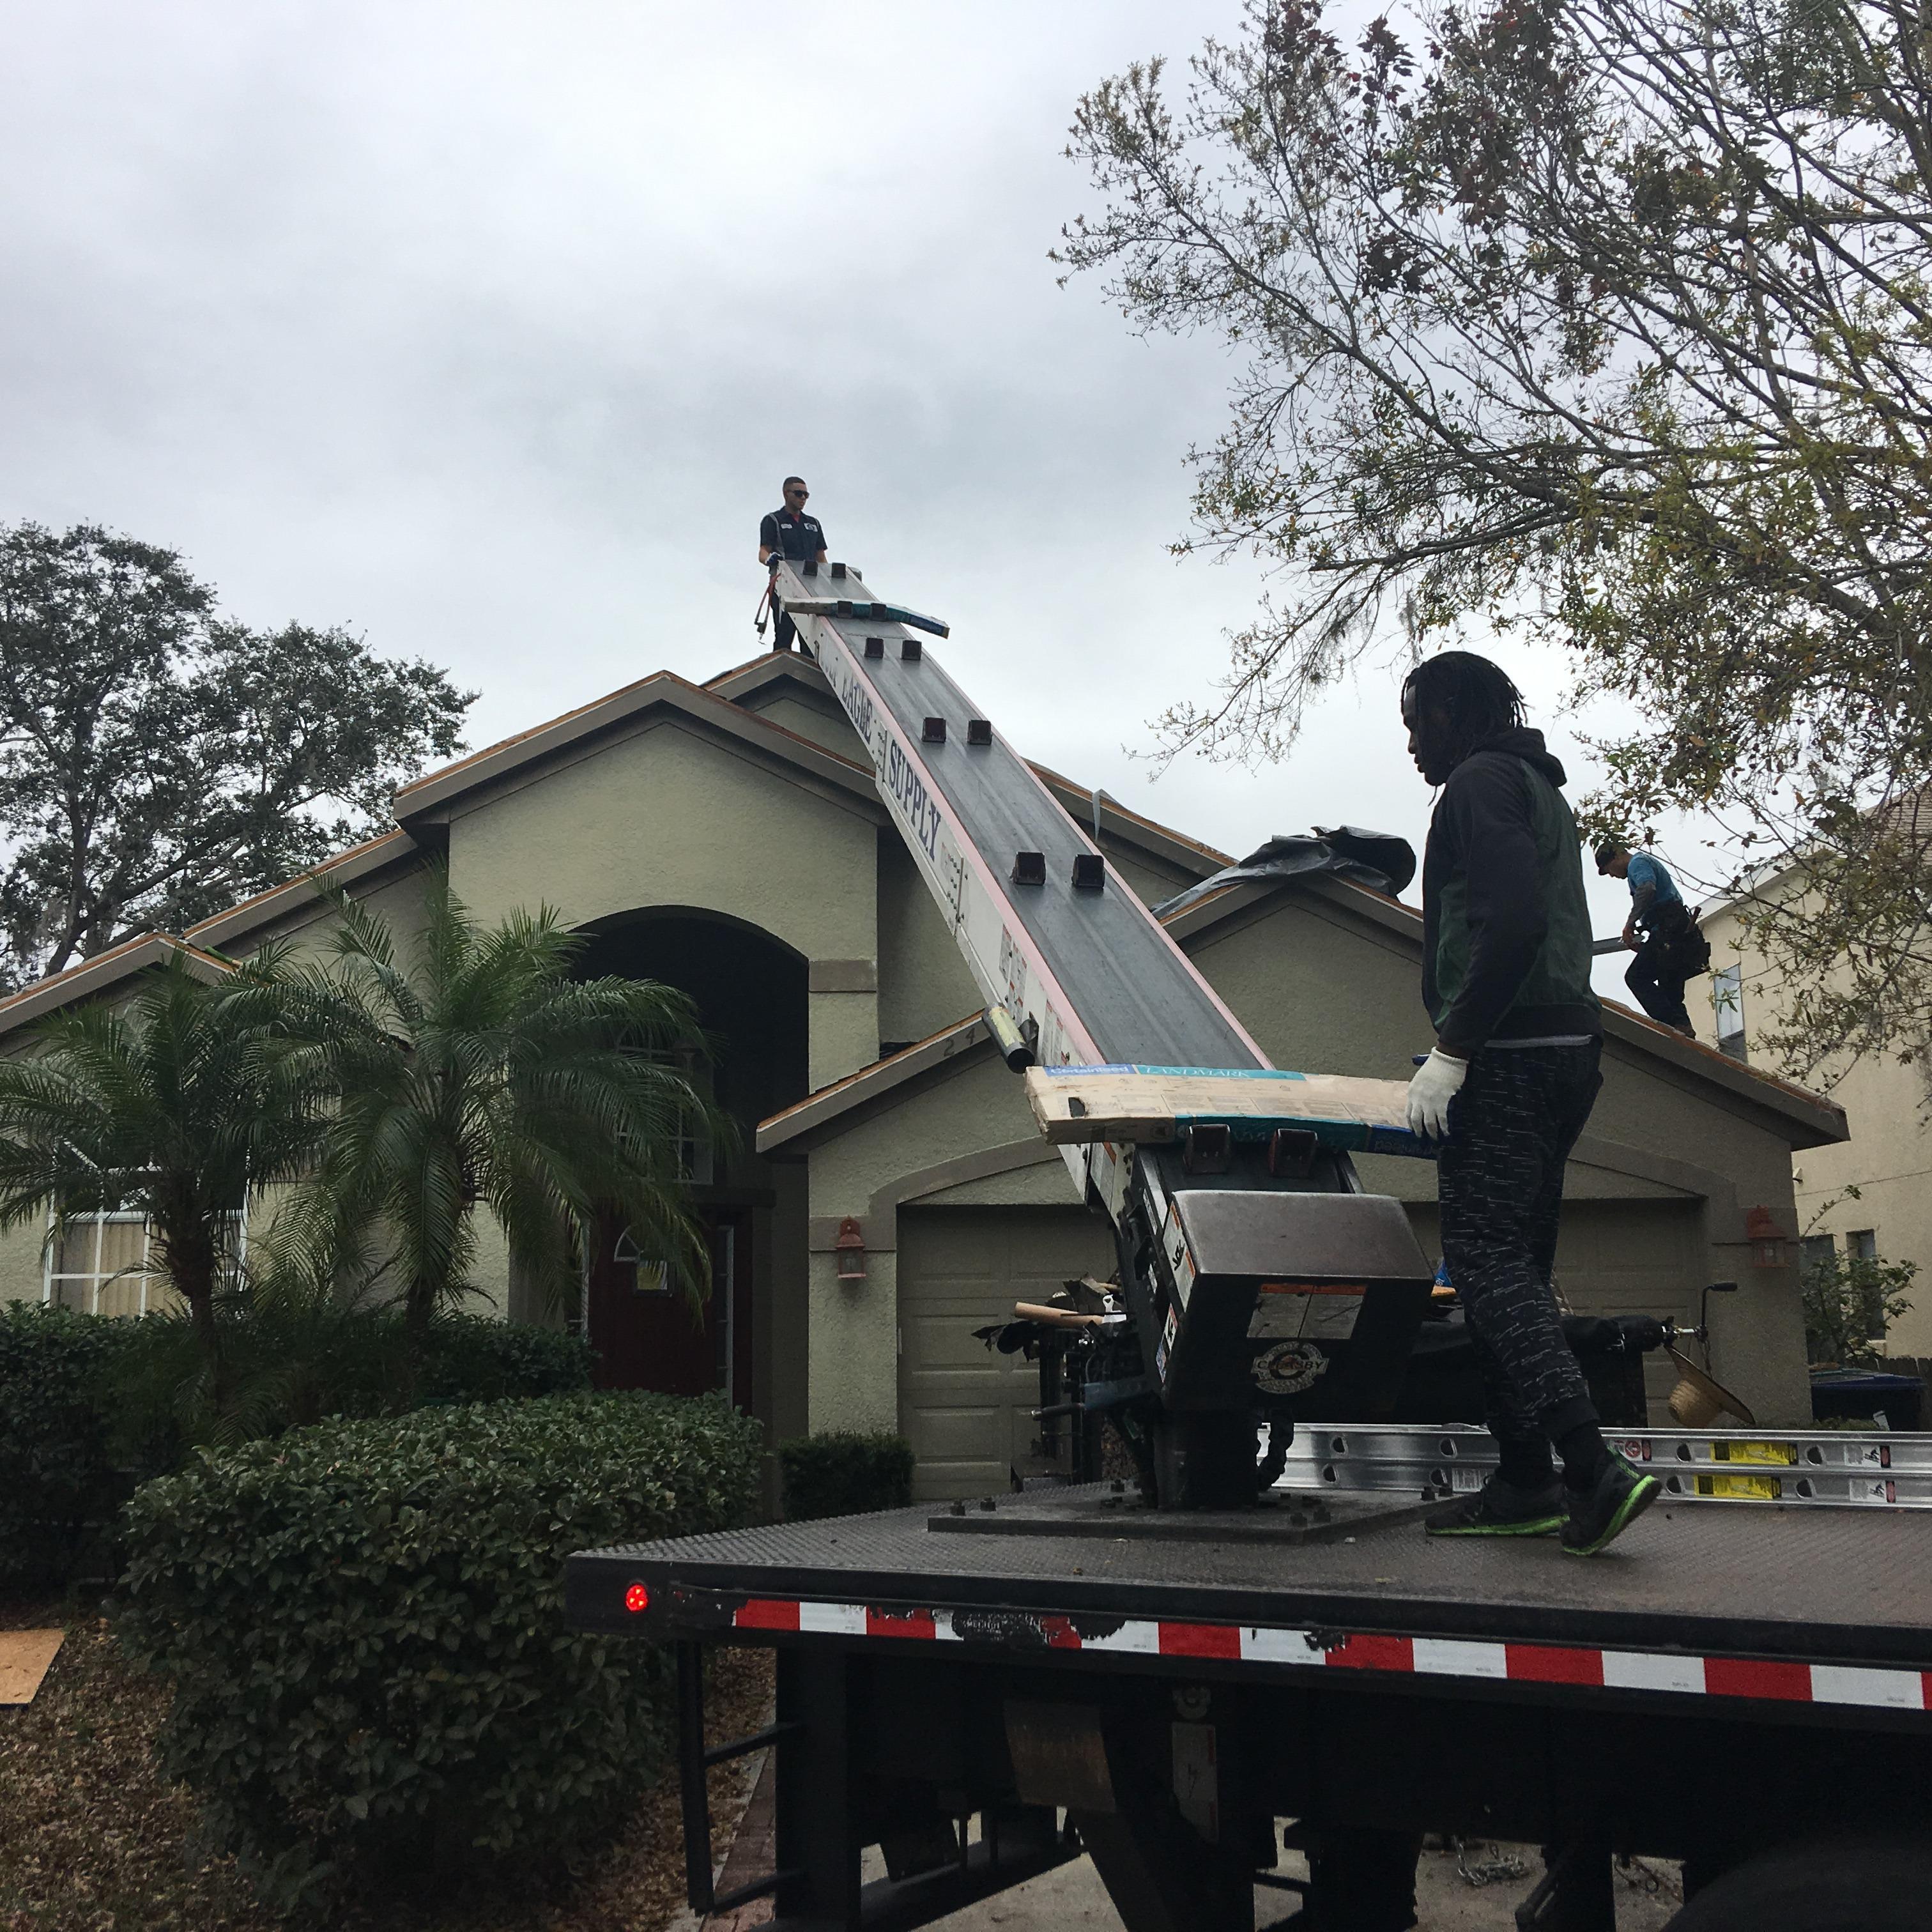 Florida RoofWerks. Inc